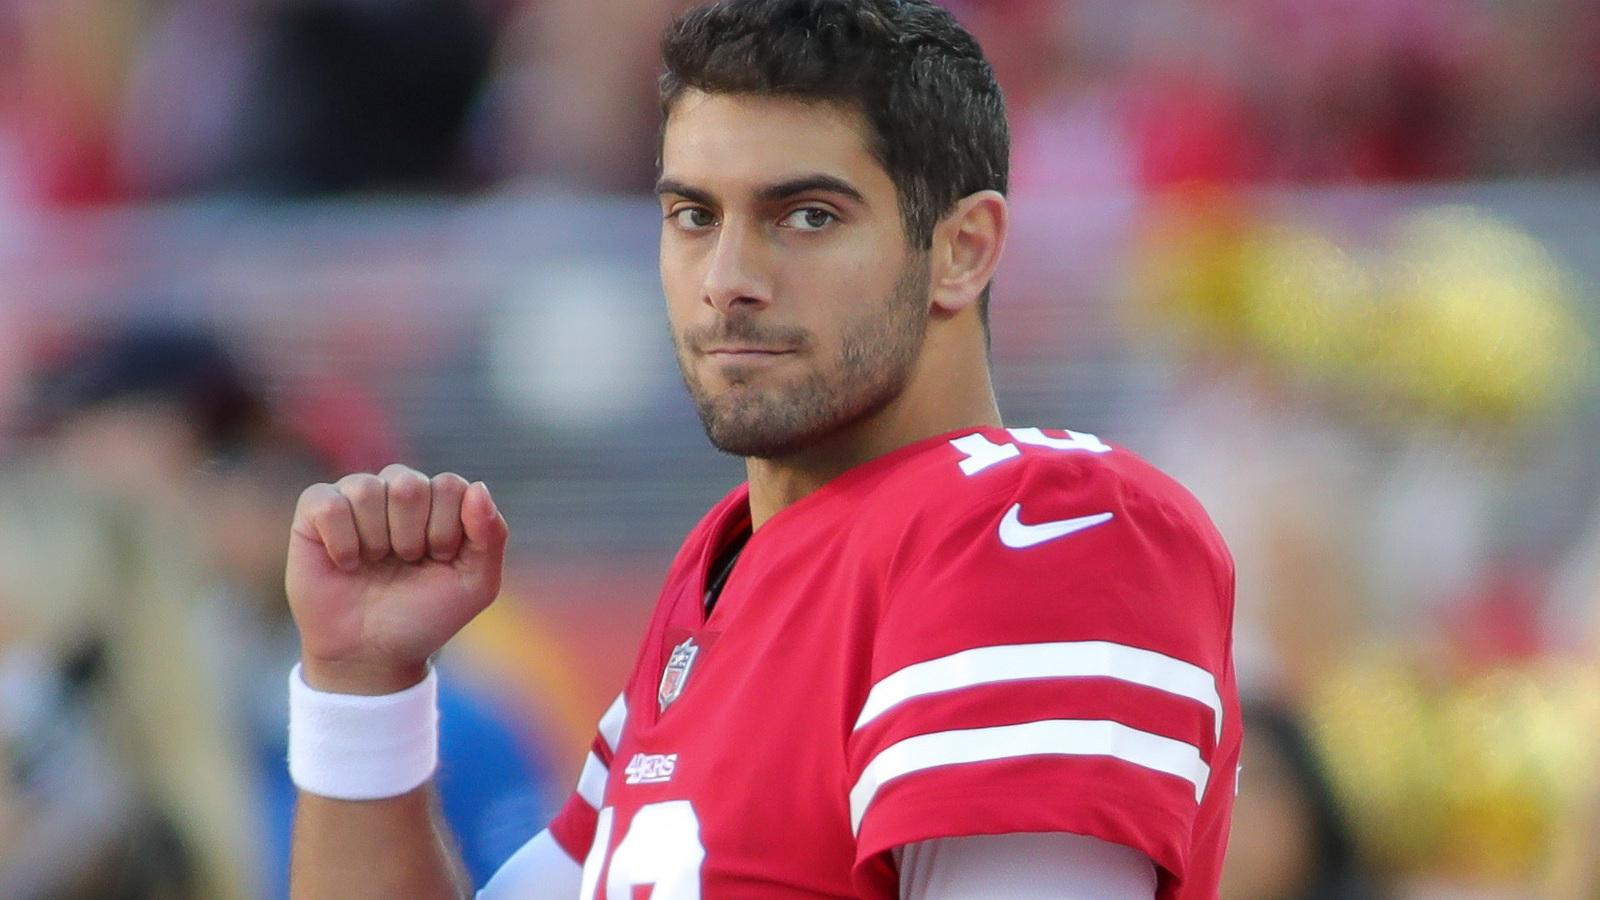 Nascar Racing Games >> The 49ers' future begins now with Jimmy Garoppolo | Yardbarker.com